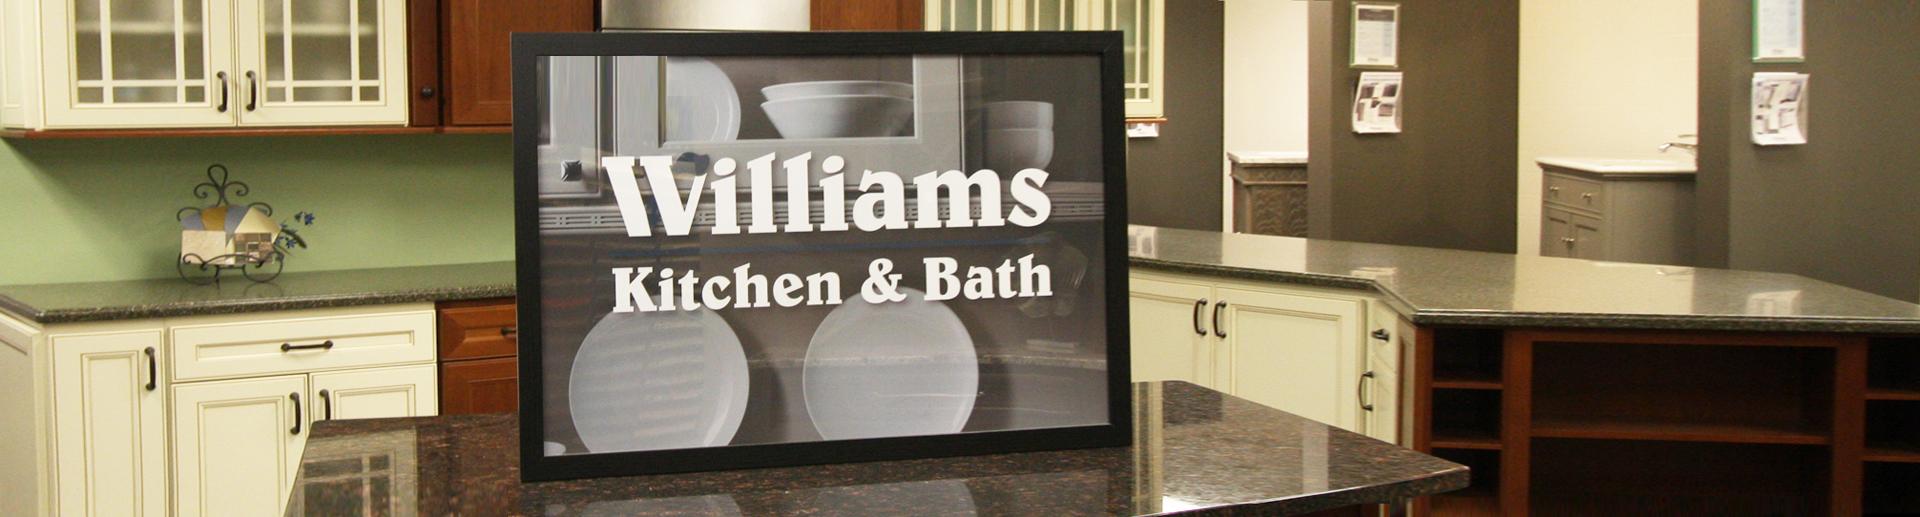 about williams williams kitchen bath. Black Bedroom Furniture Sets. Home Design Ideas